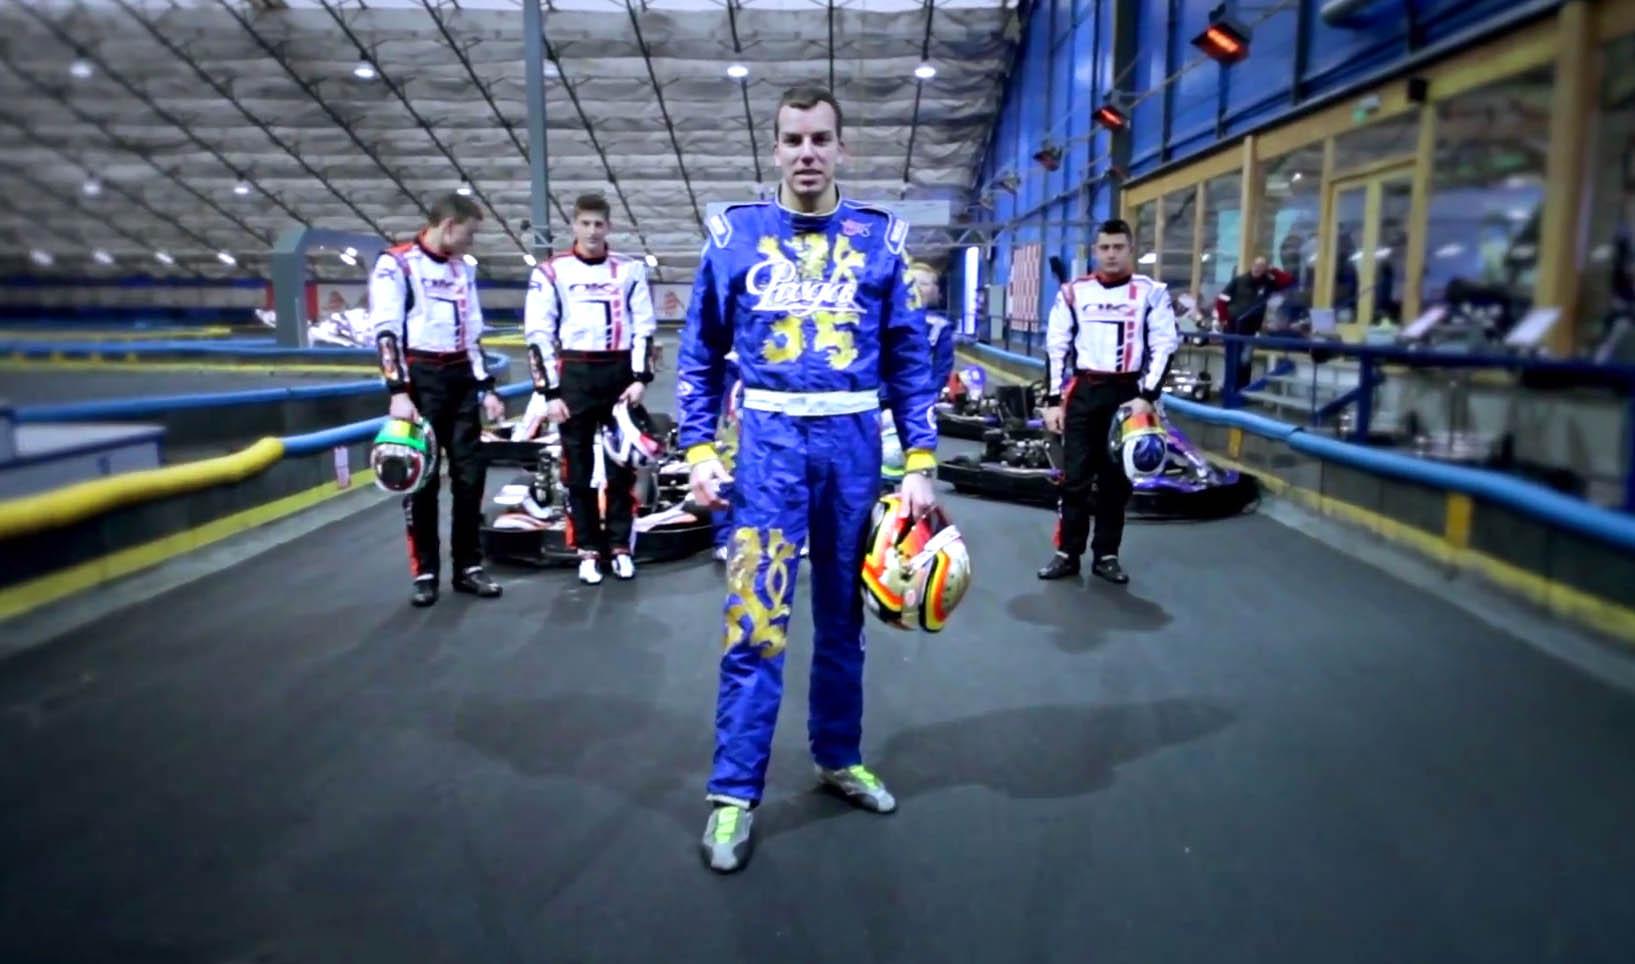 VIDEO: Rental Kart Crash Race! – Professional Drivers fight at Praga Arena